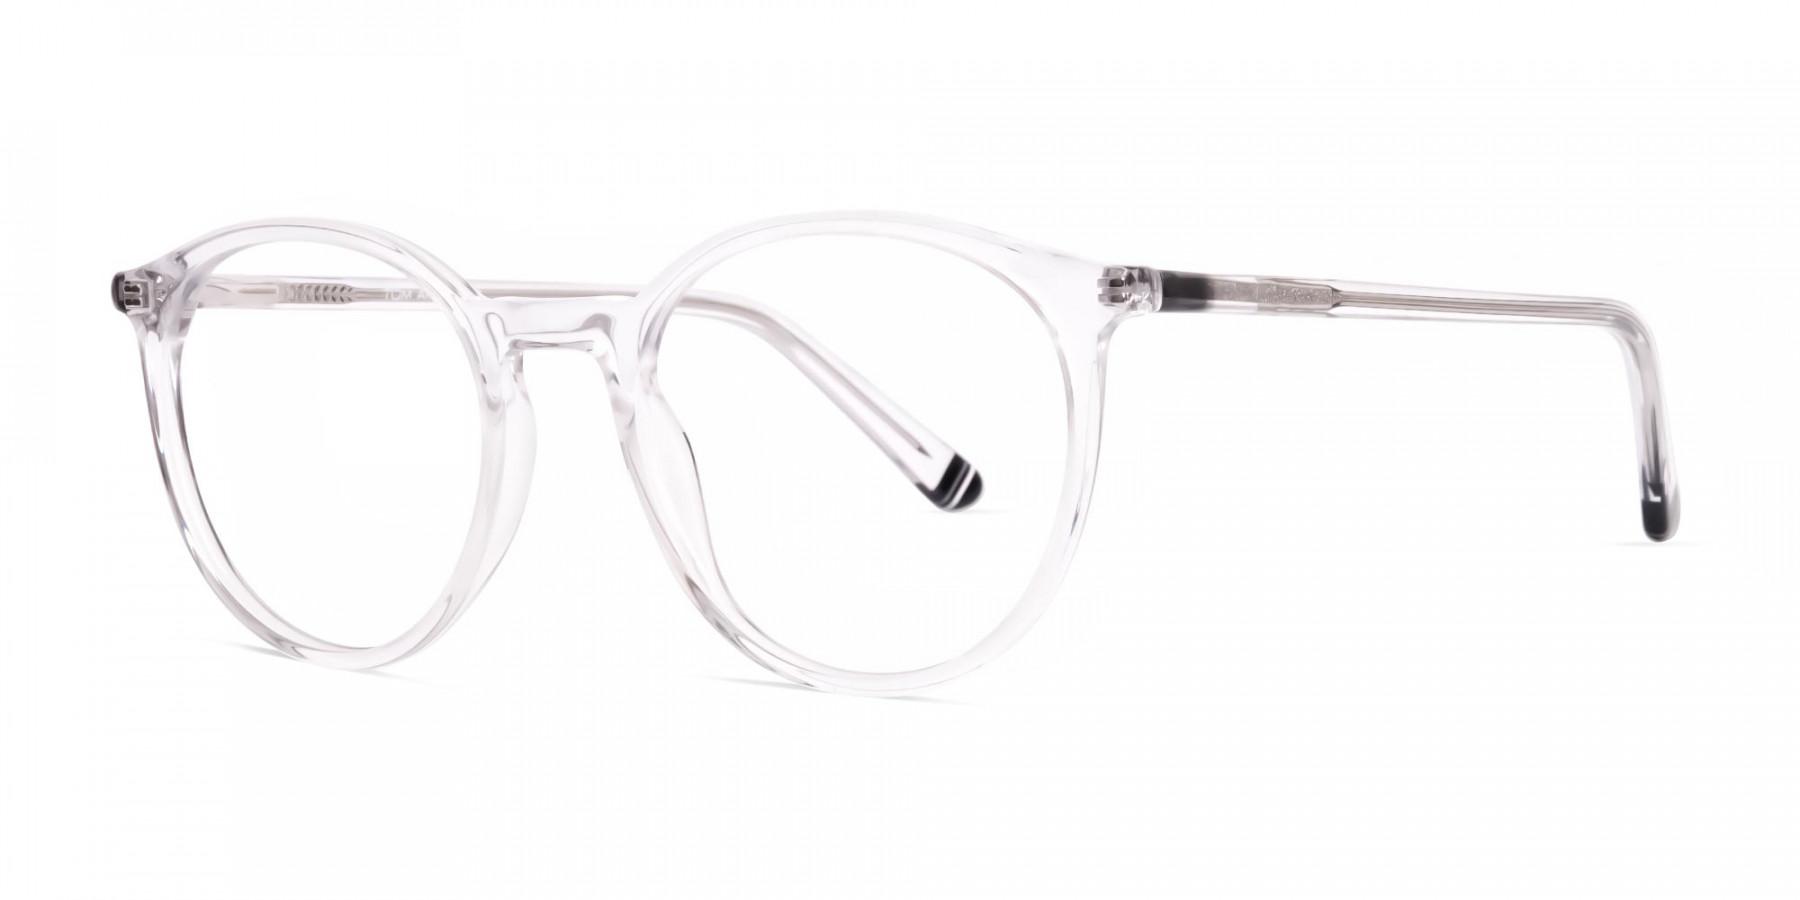 transparent-round-full-rim-glasses-frames-1